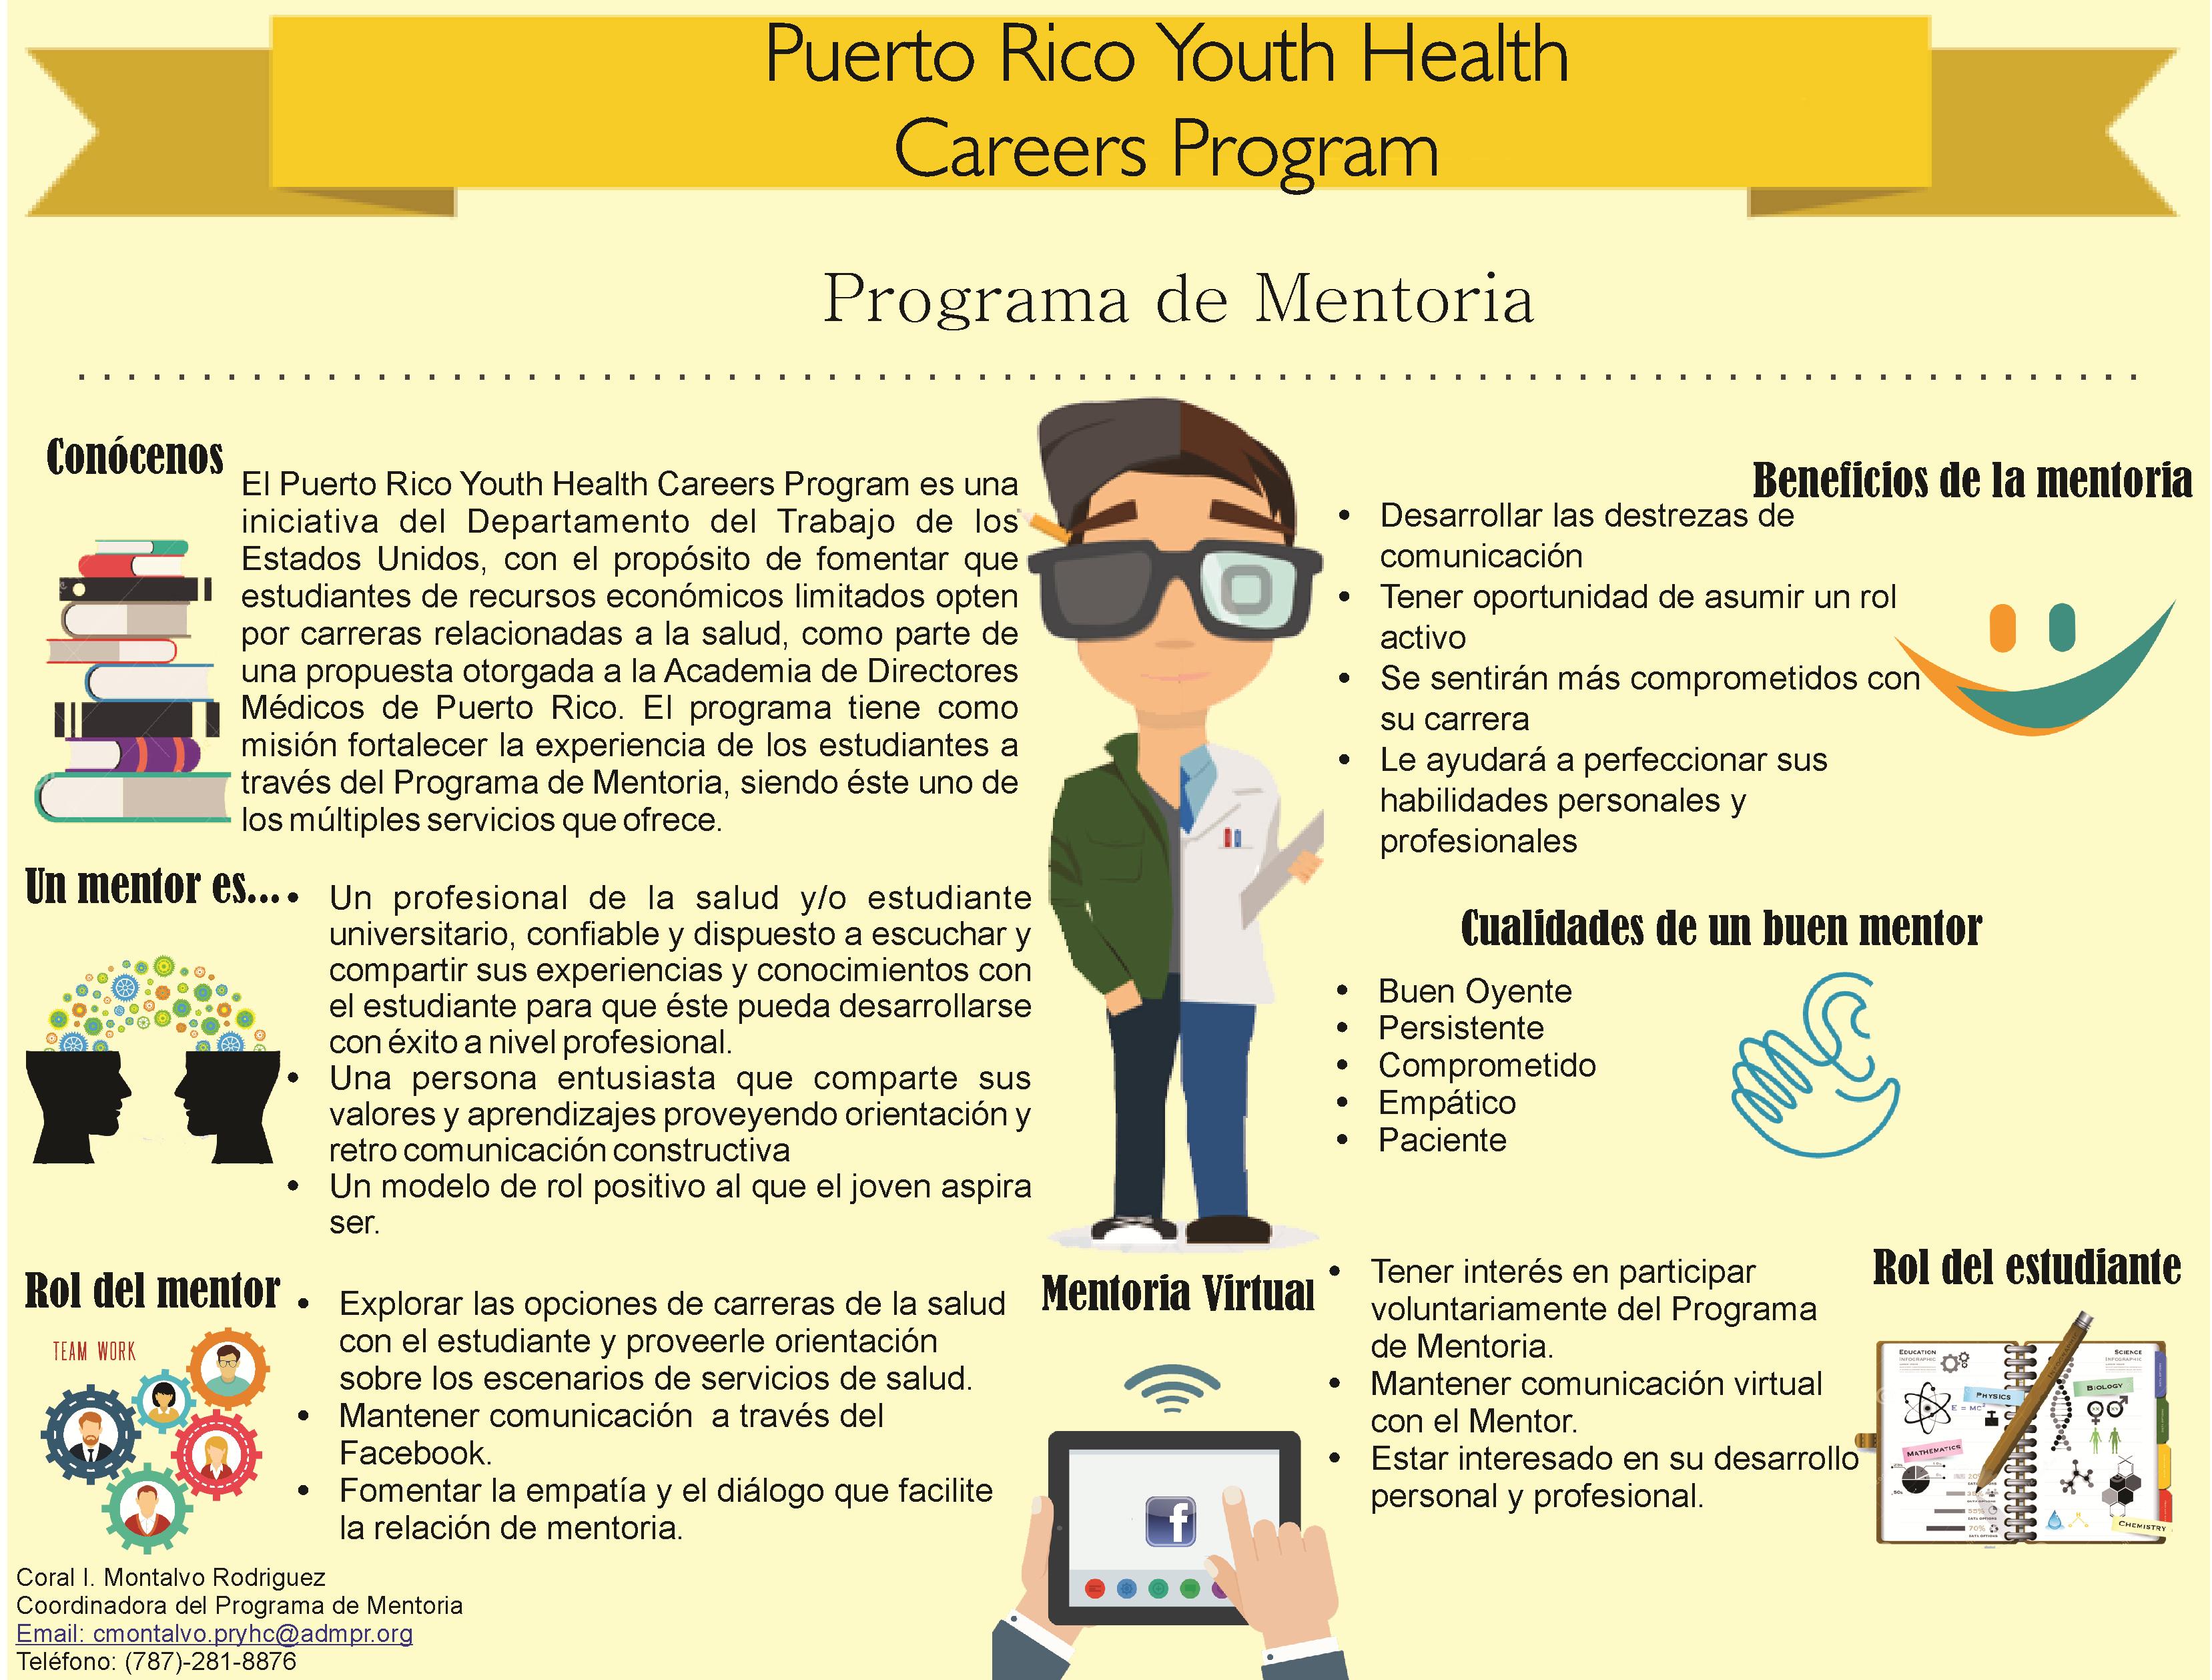 Infographic PRYHC